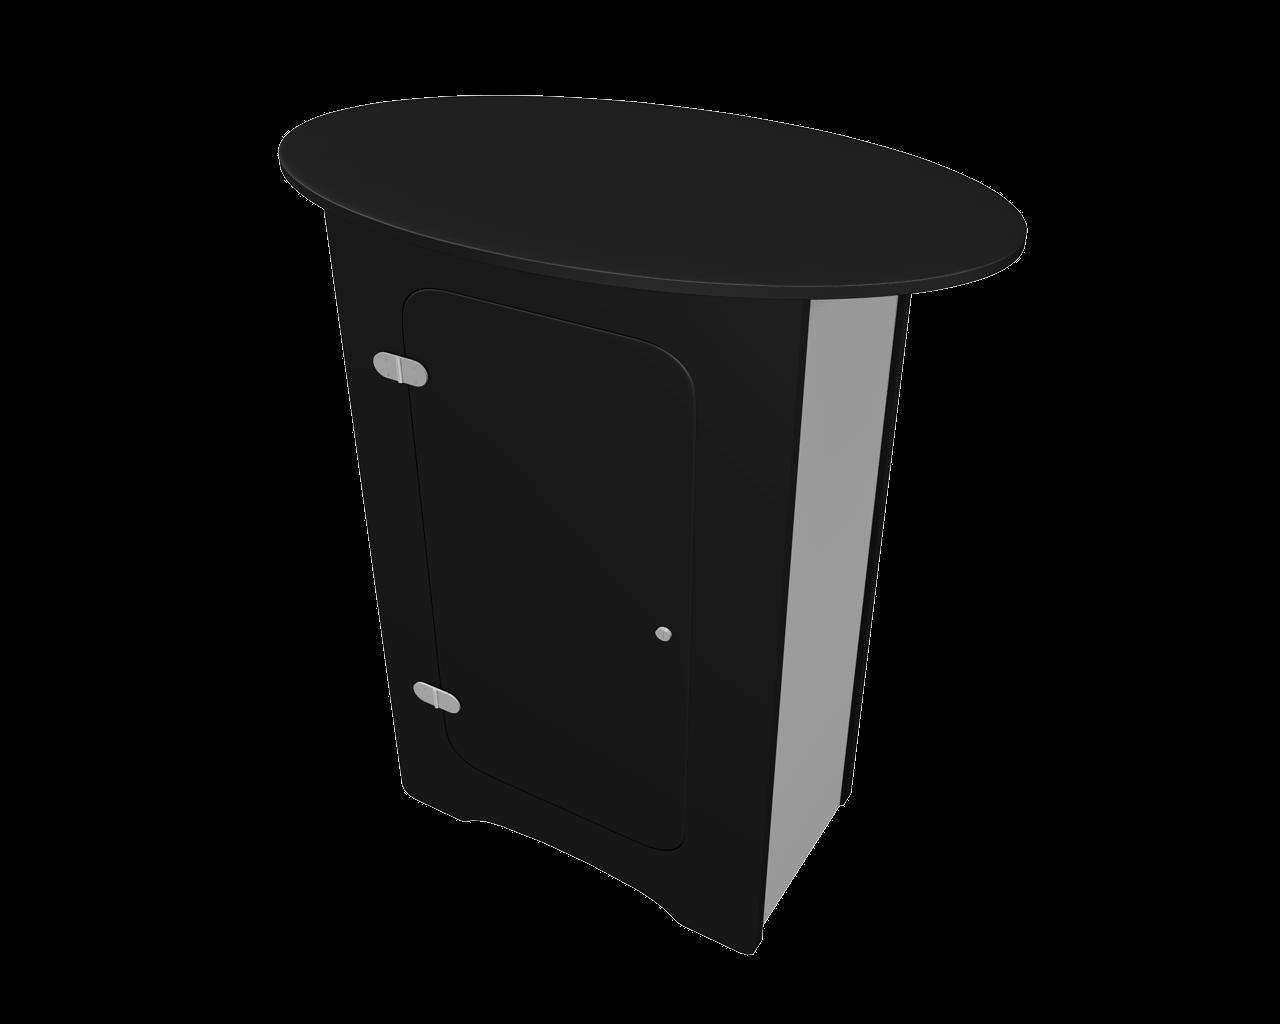 XVline NLC3 Locking Counter